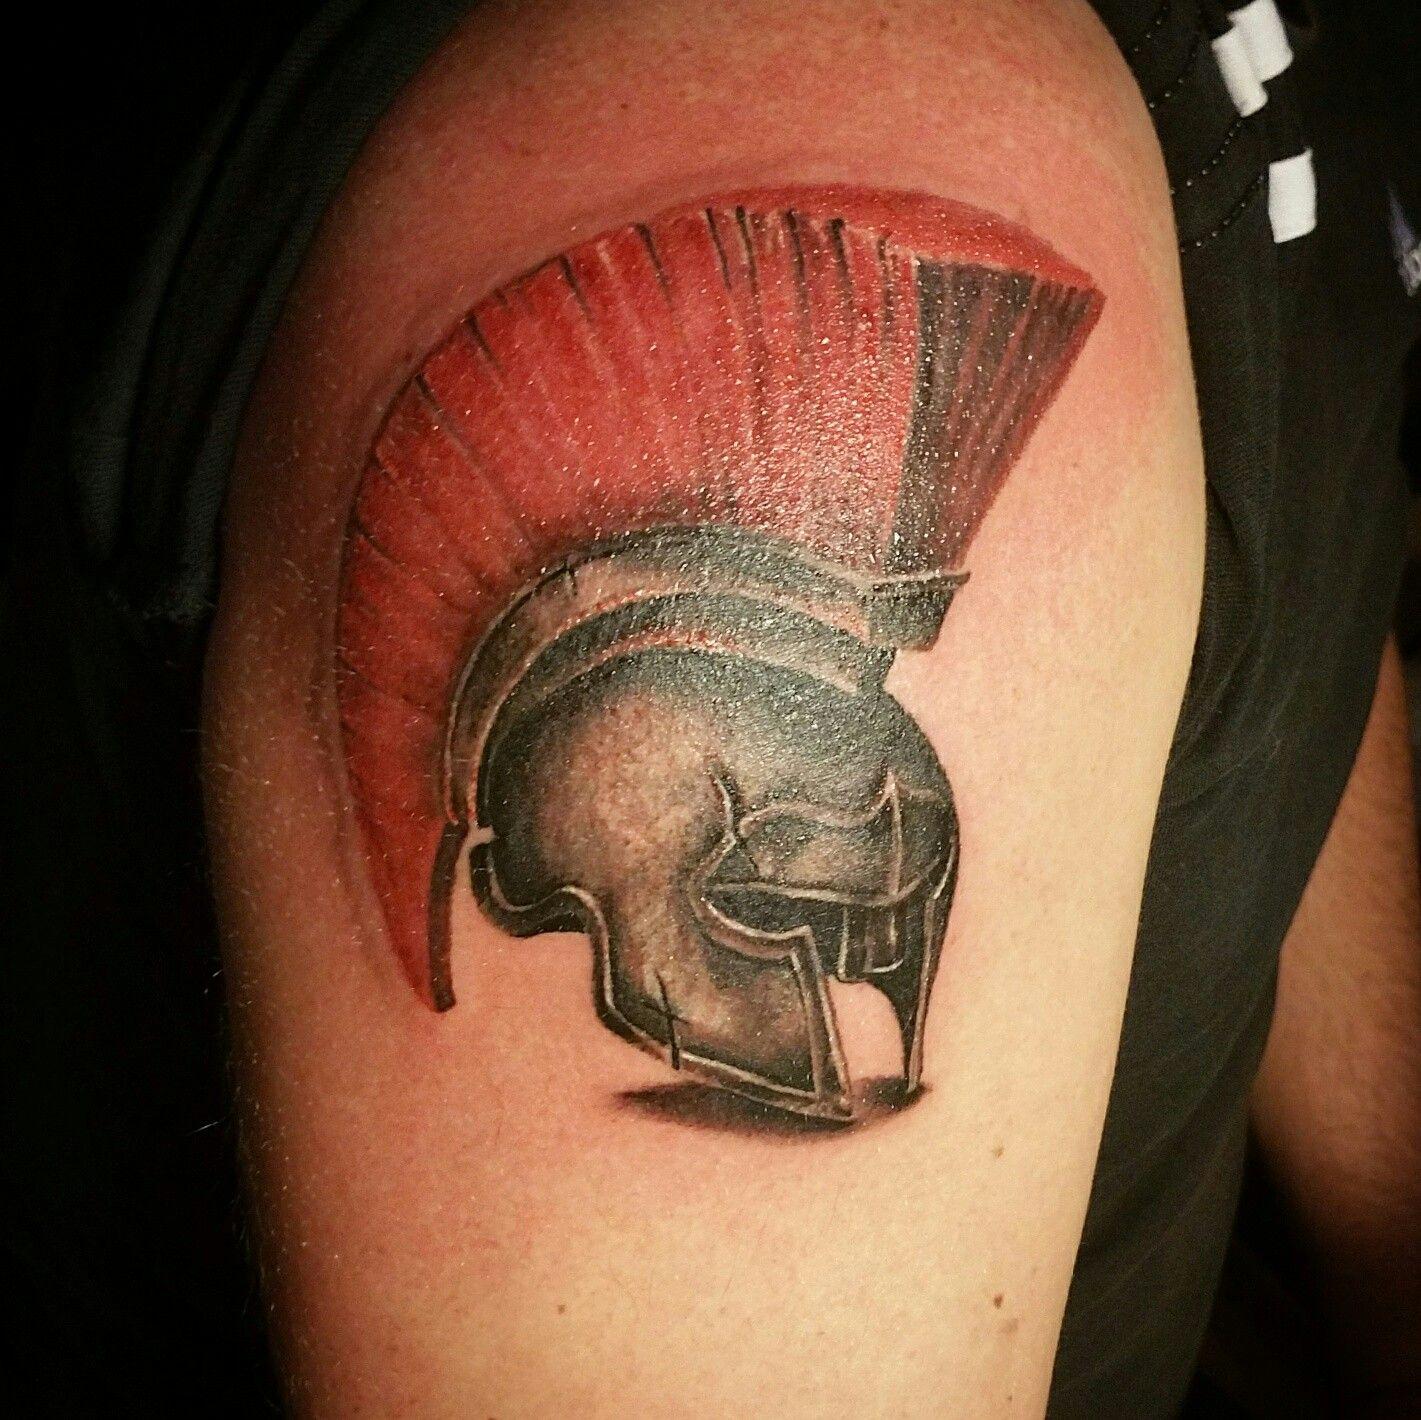 Татуировка на плече - шлем гладиатора. Тату сделана одним ...